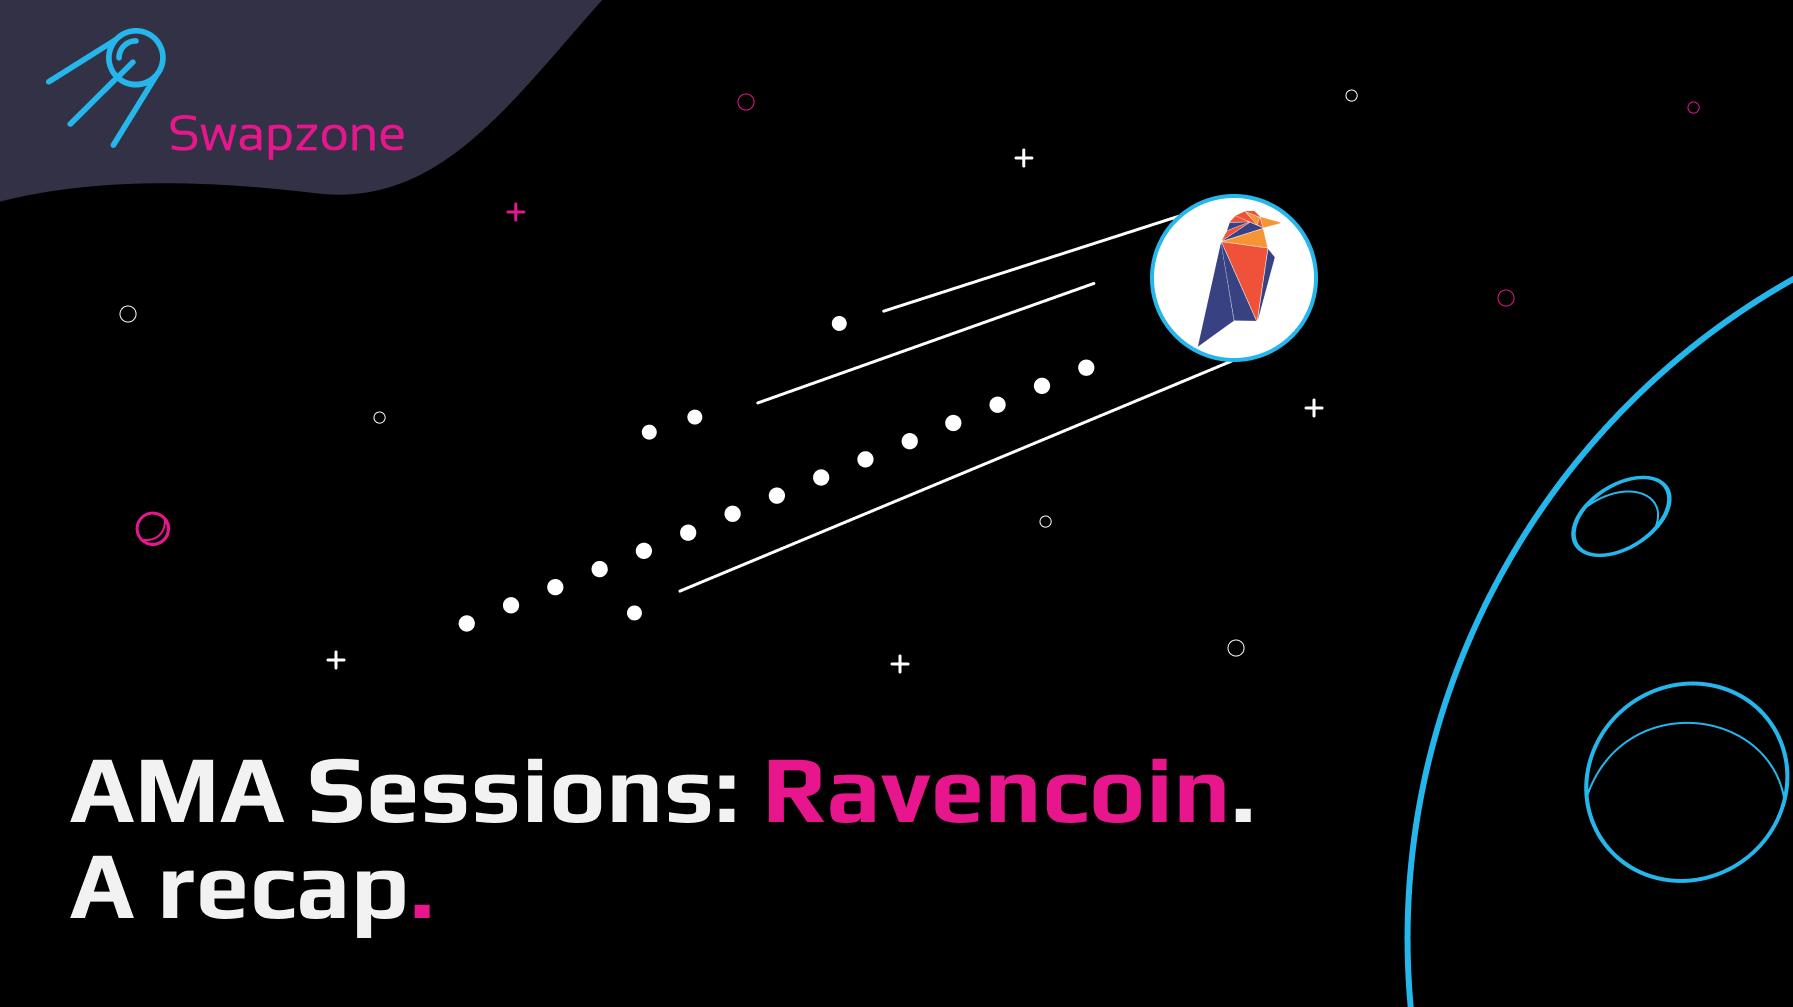 Swapzone's AMA Sessions: Ravencoin ❘ A Recap